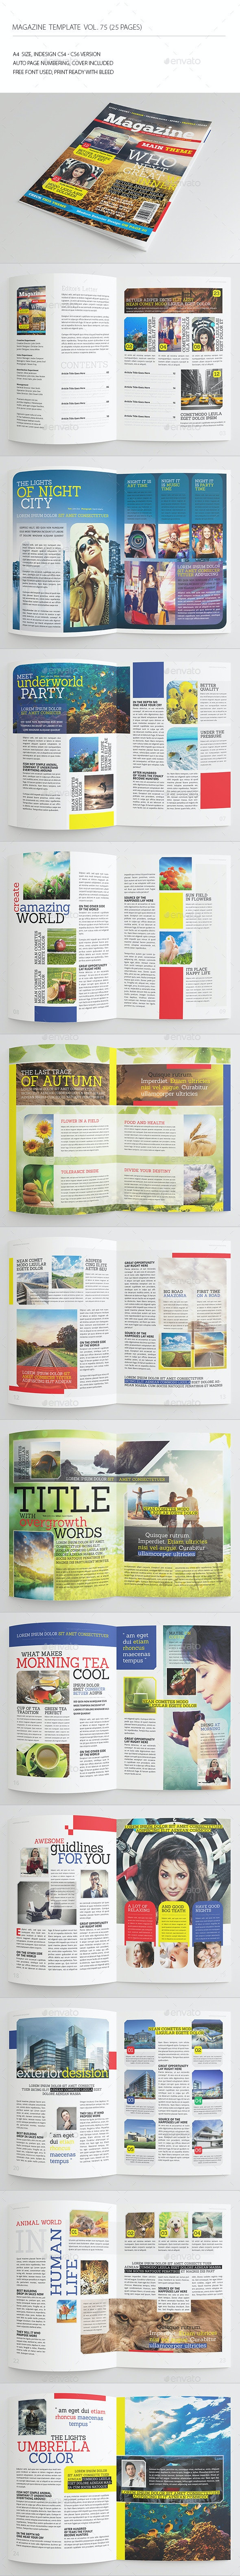 25 Pages Modern Magazine Vol75 - Magazines Print Templates